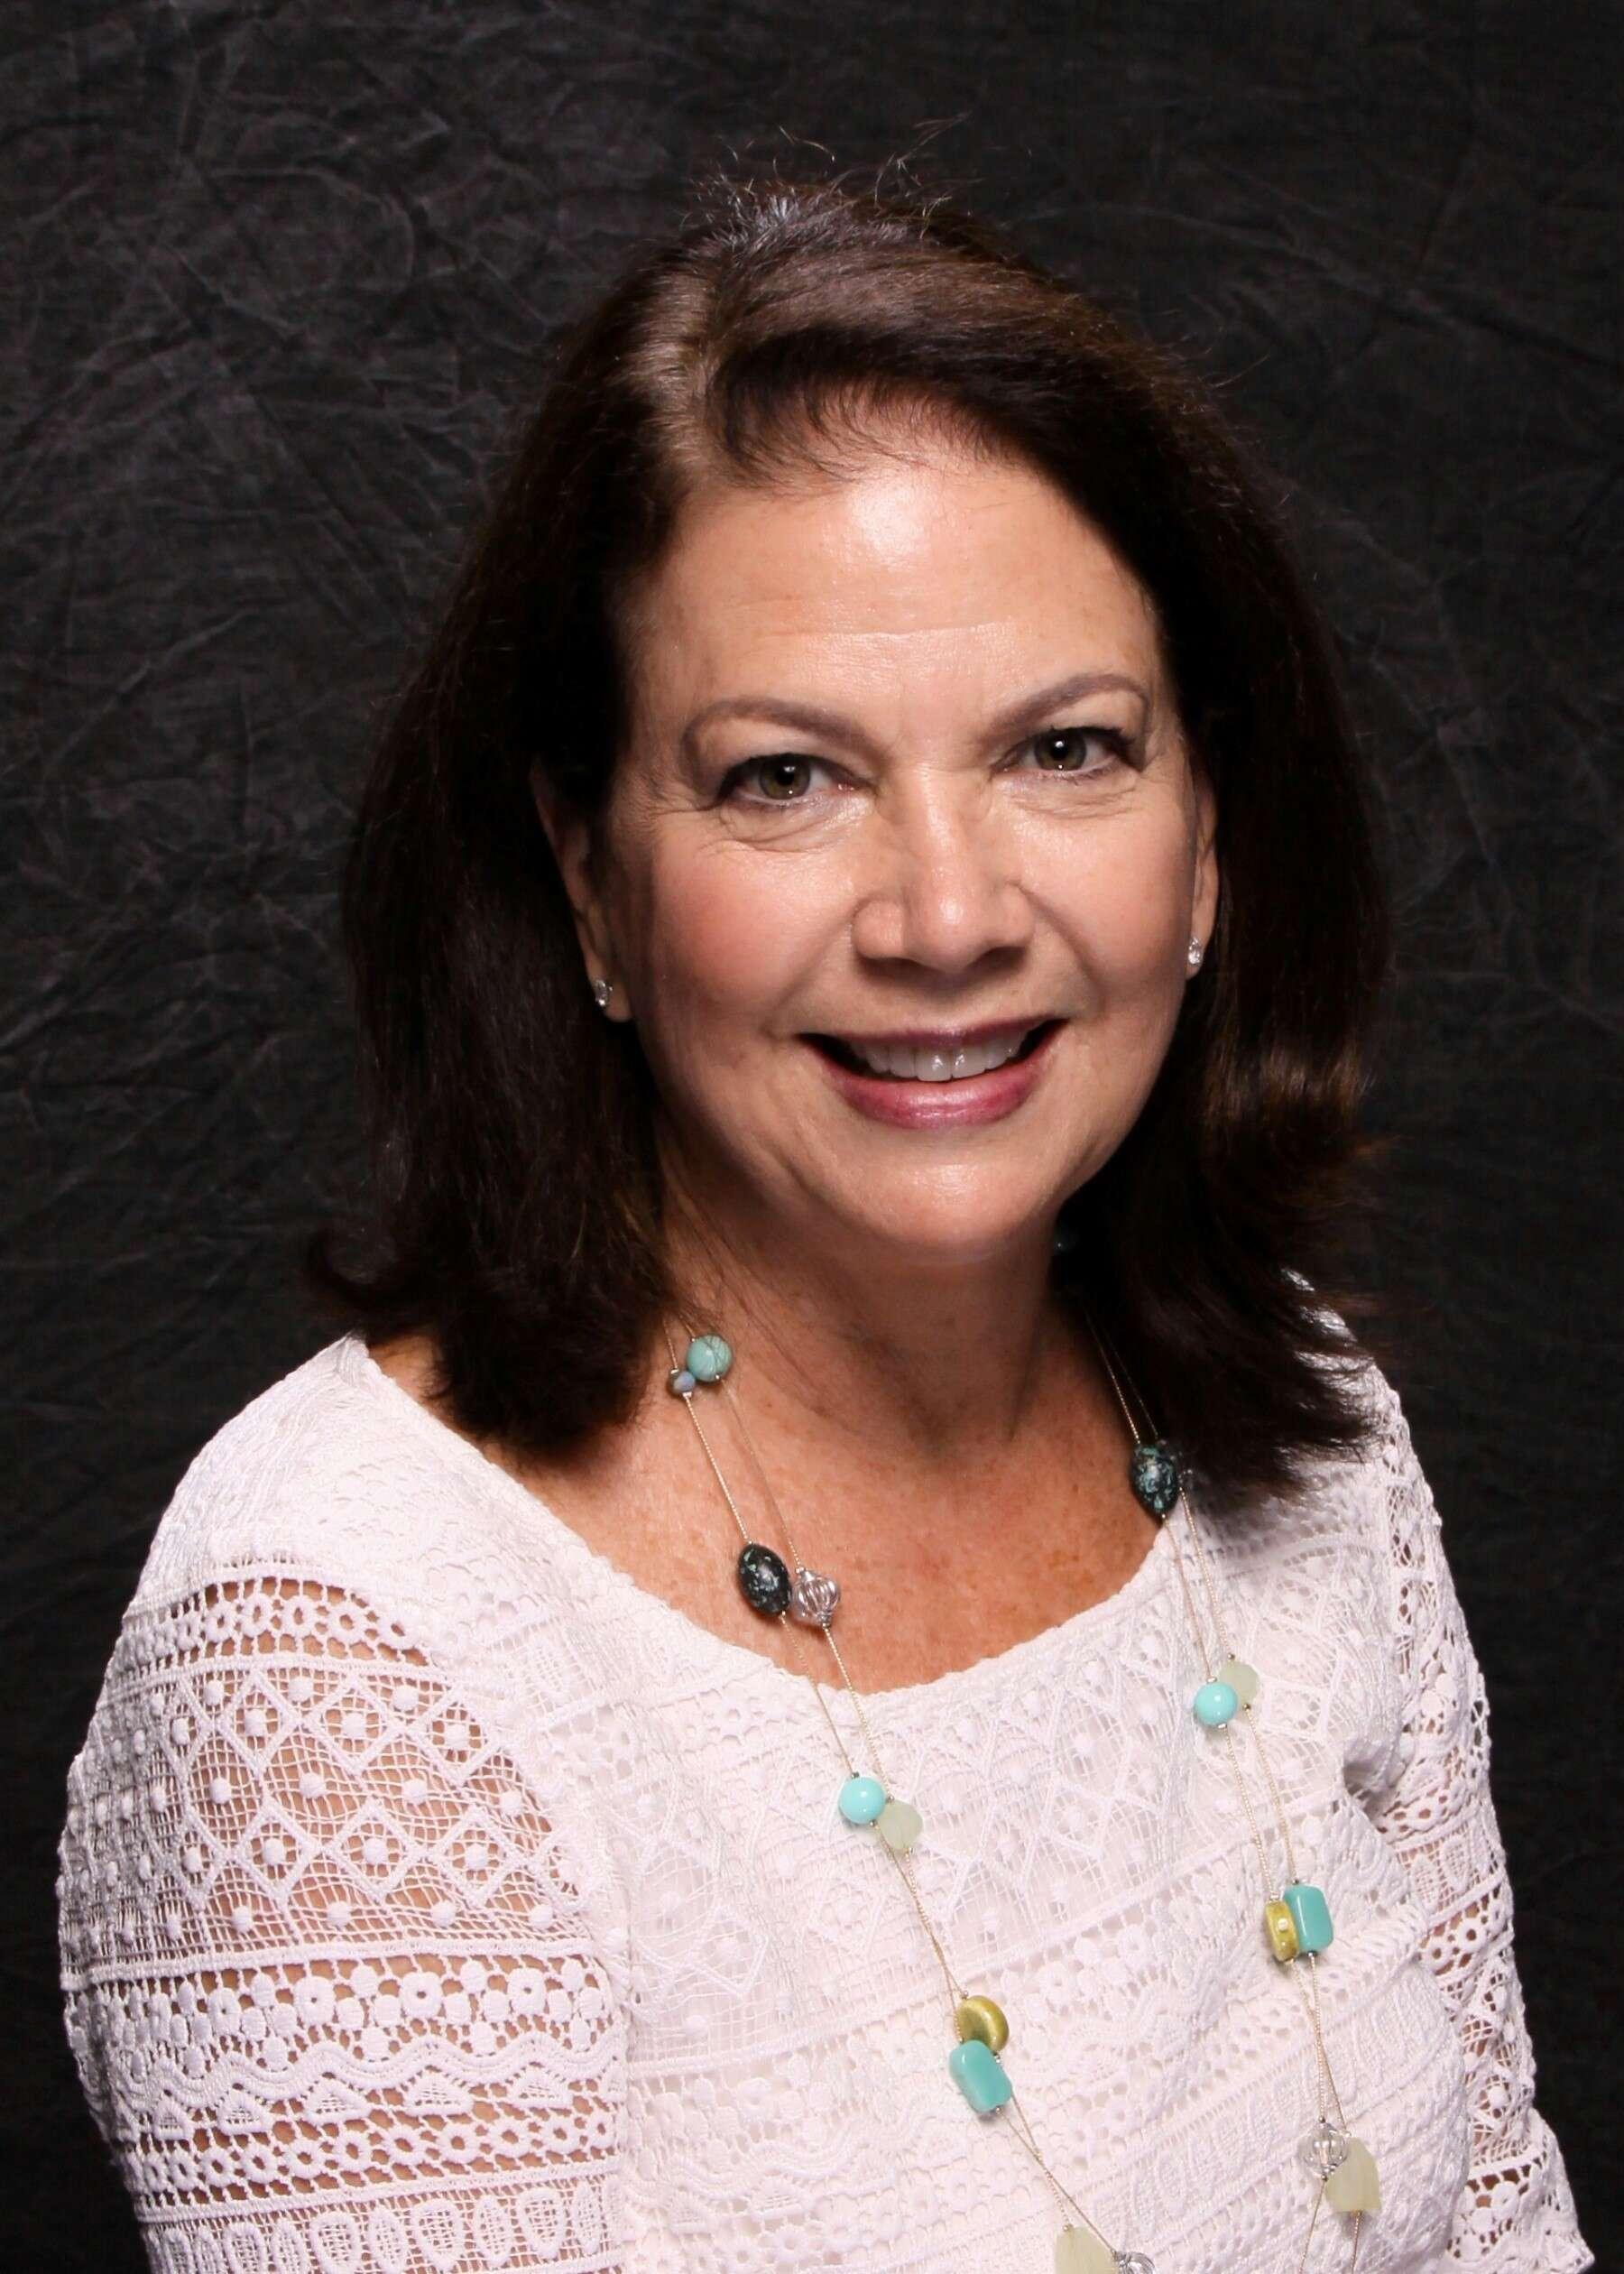 Leslie Sachs